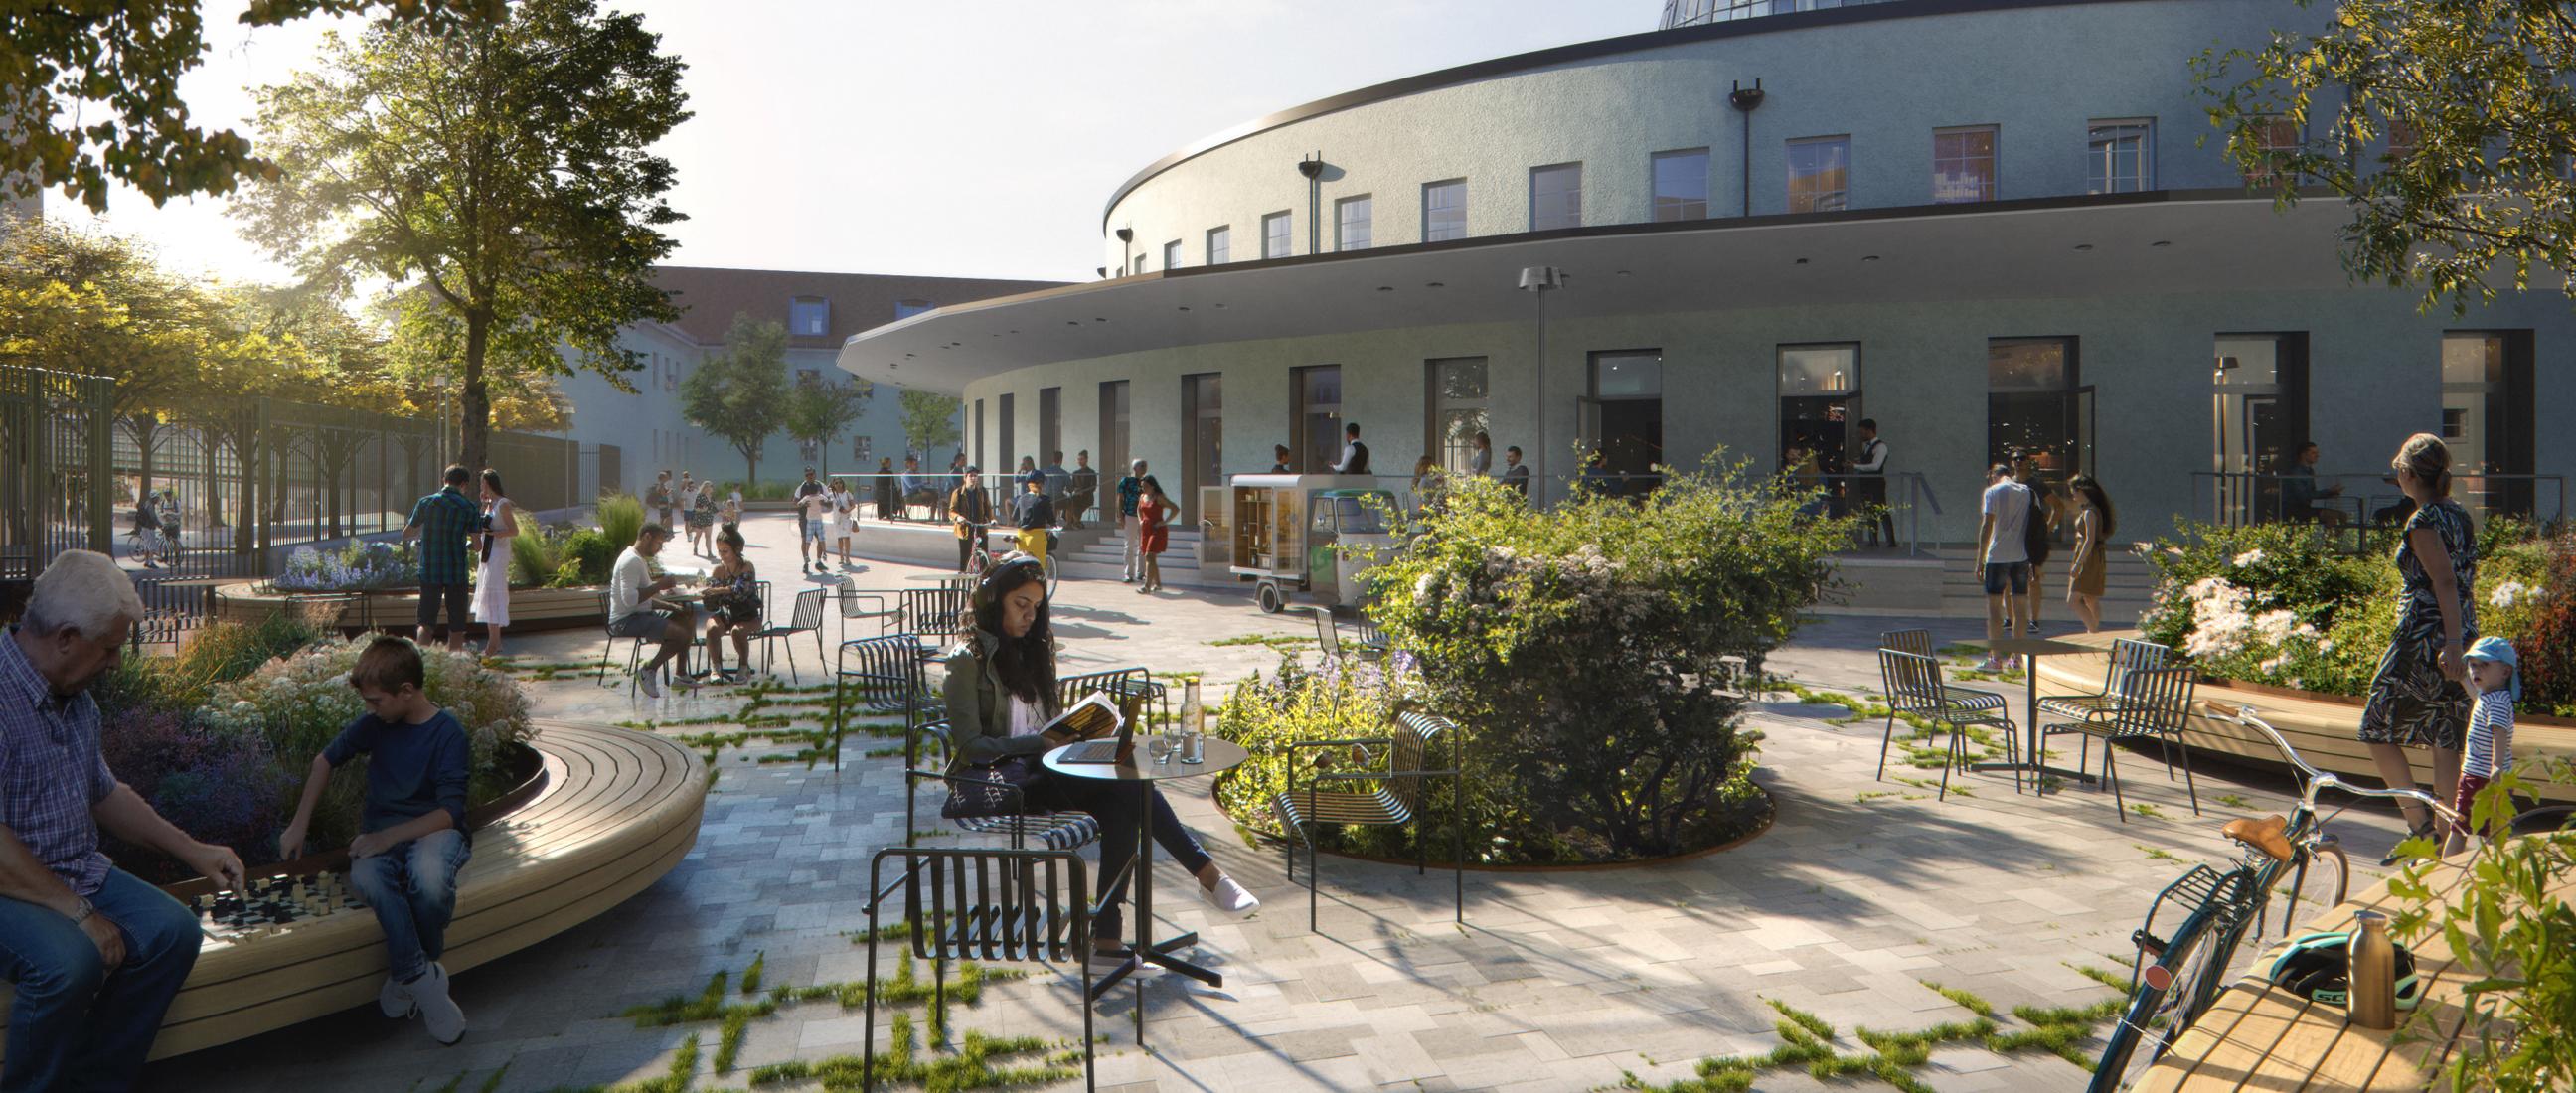 Arnulfpost office development, Munich, Germany